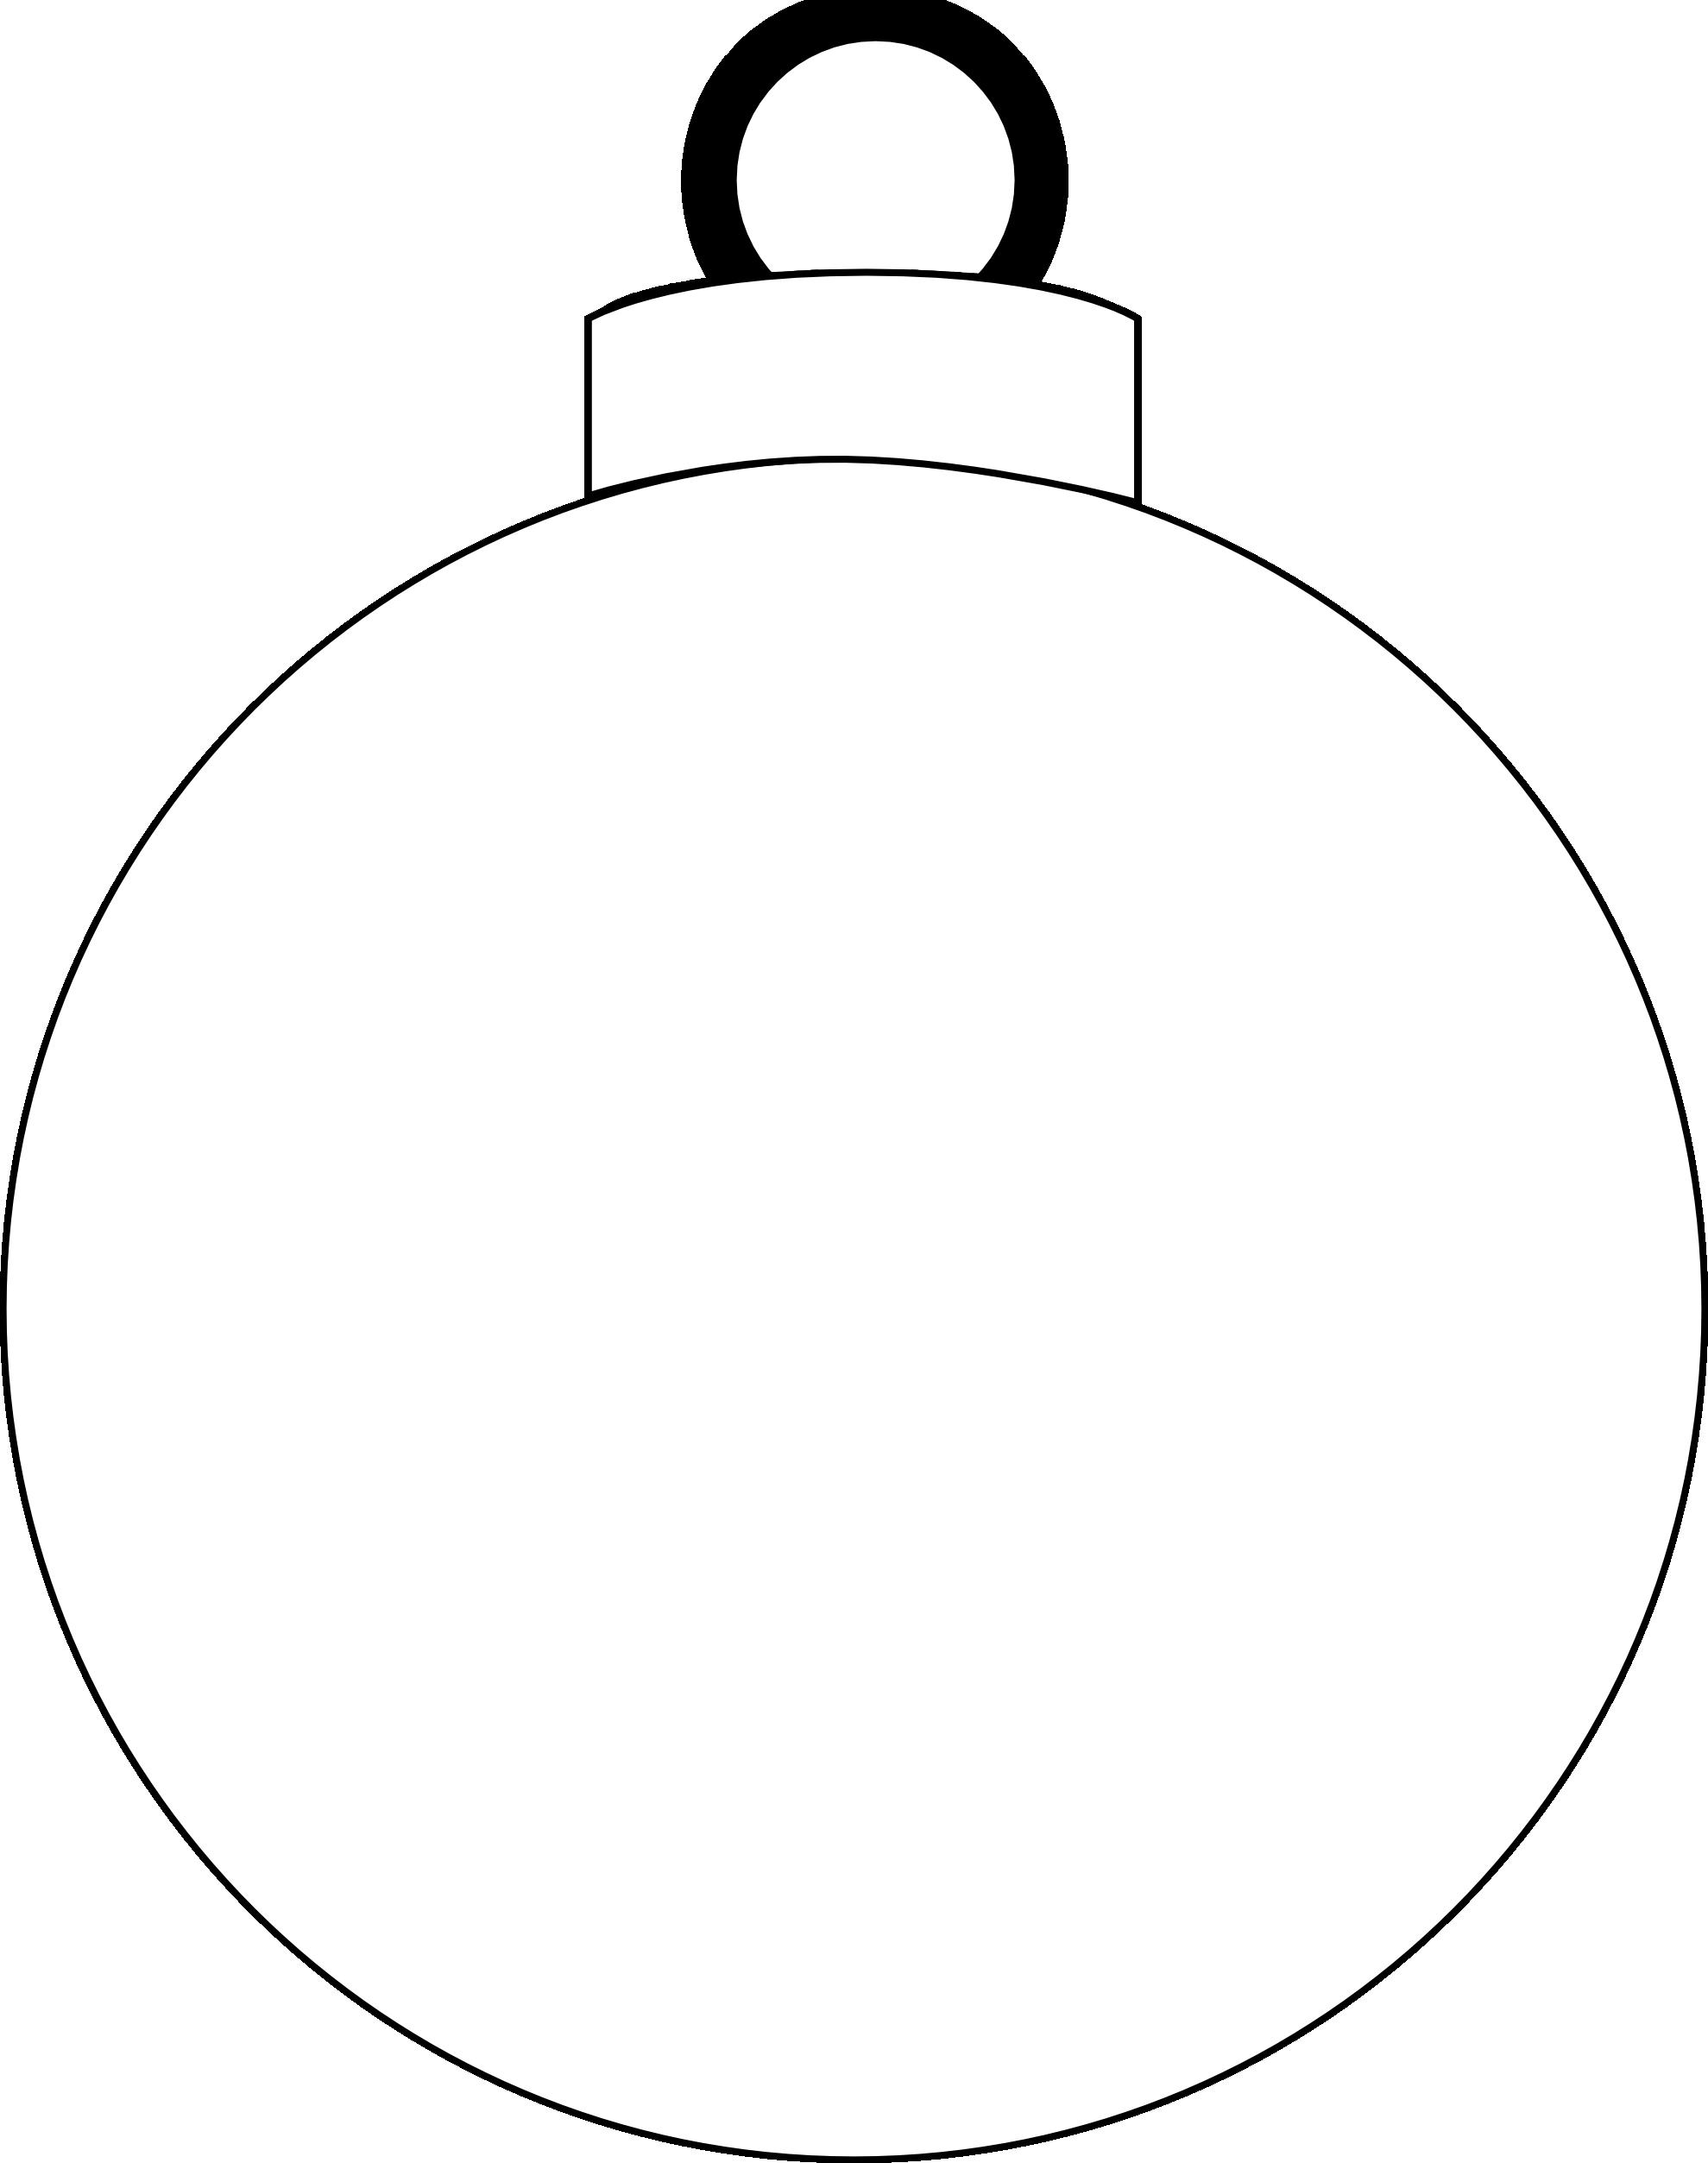 Vintage christmas ornament clipart graphic freeuse stock Christmas Ornament Clipart Black And White | Free download best ... graphic freeuse stock